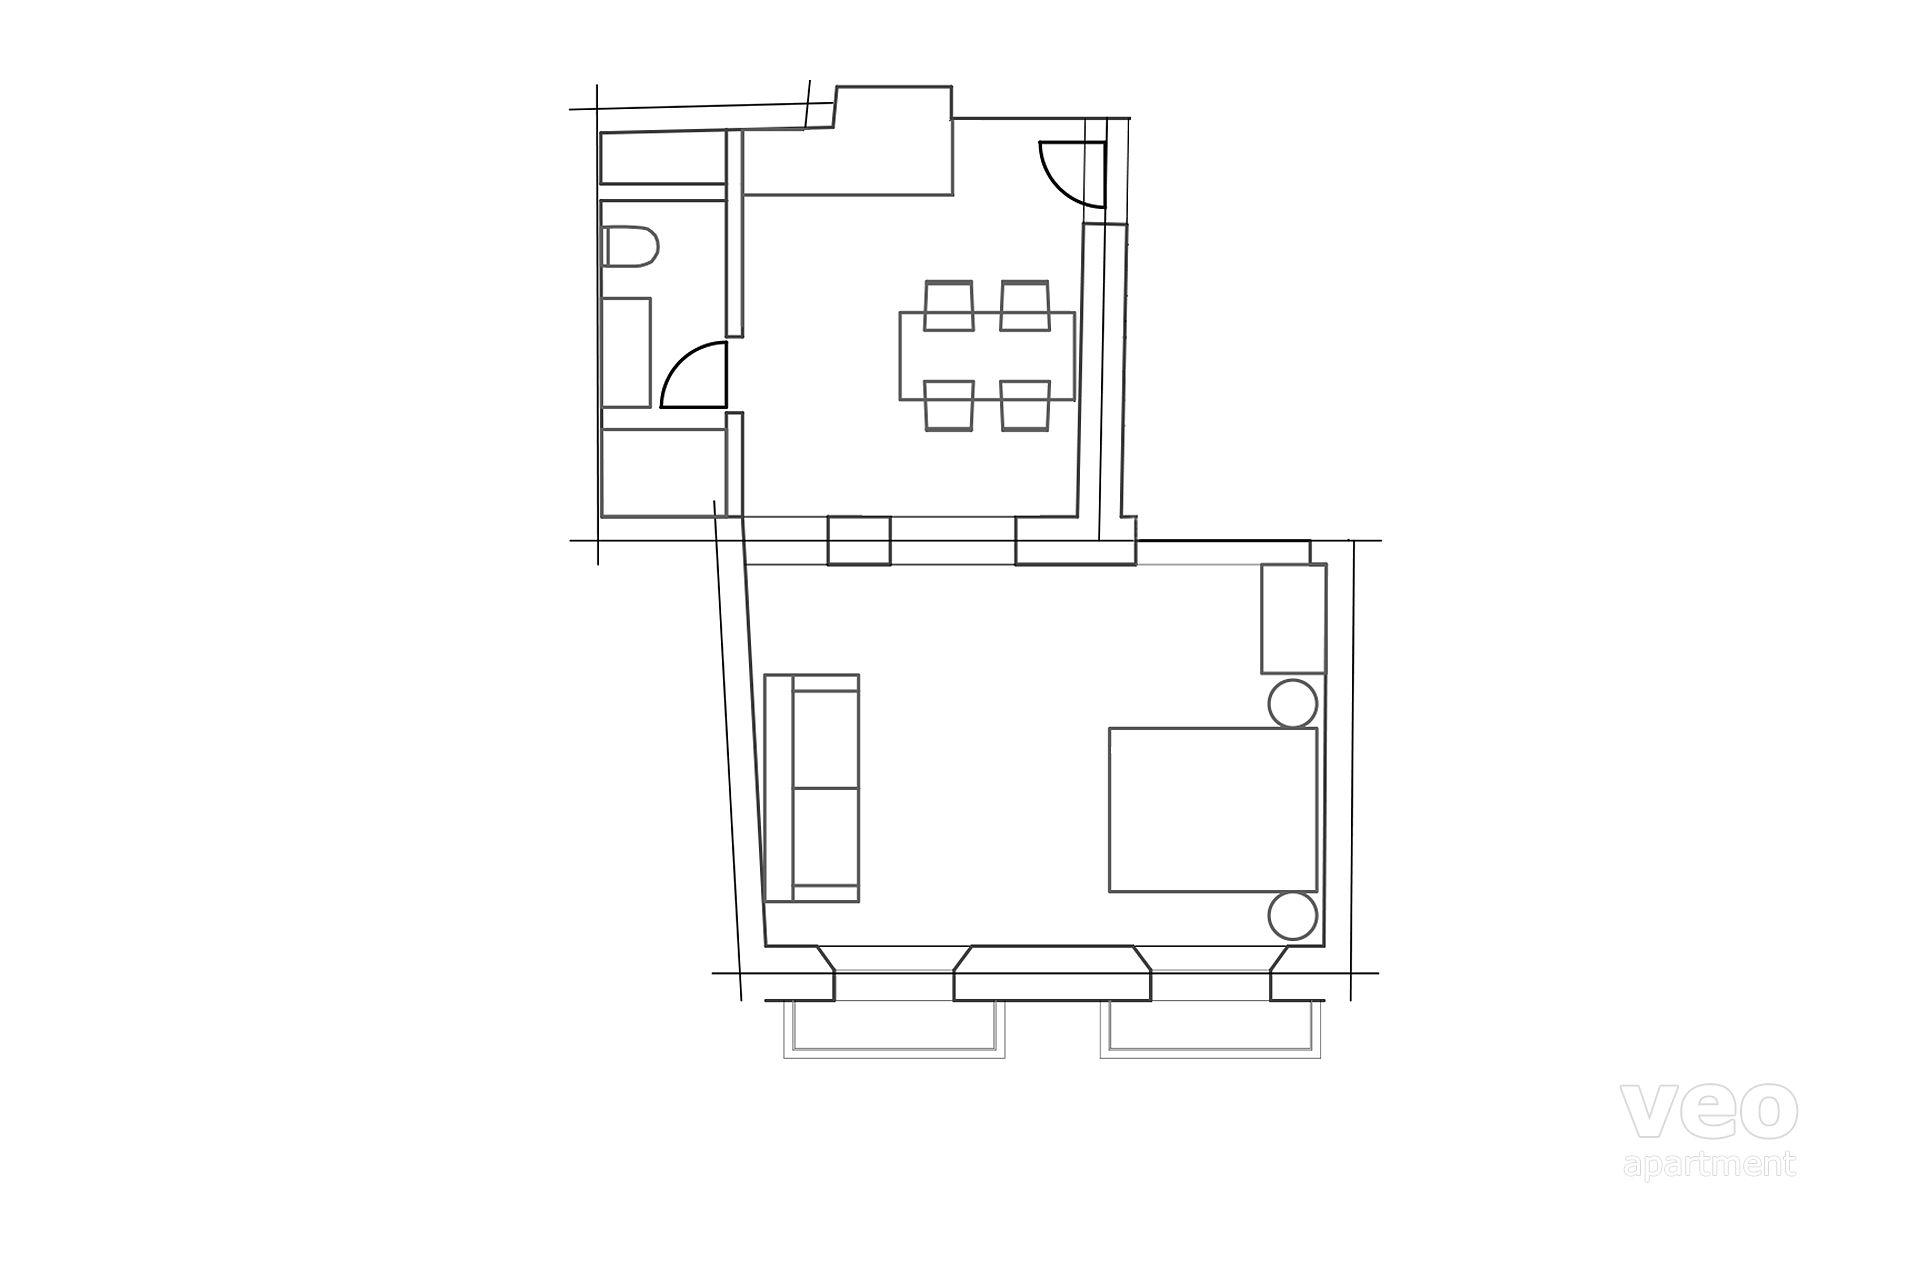 Kartell Tiptop Side Table furthermore 105829 Rental Apartment Meribel Mottaret besides Apartment Seville 0798 Rodrigo Triana 2 furthermore Spain Catalonia Barcelona Interior Amazing Views Of Sagrada Familia as well 43799888. on spain sofa bed